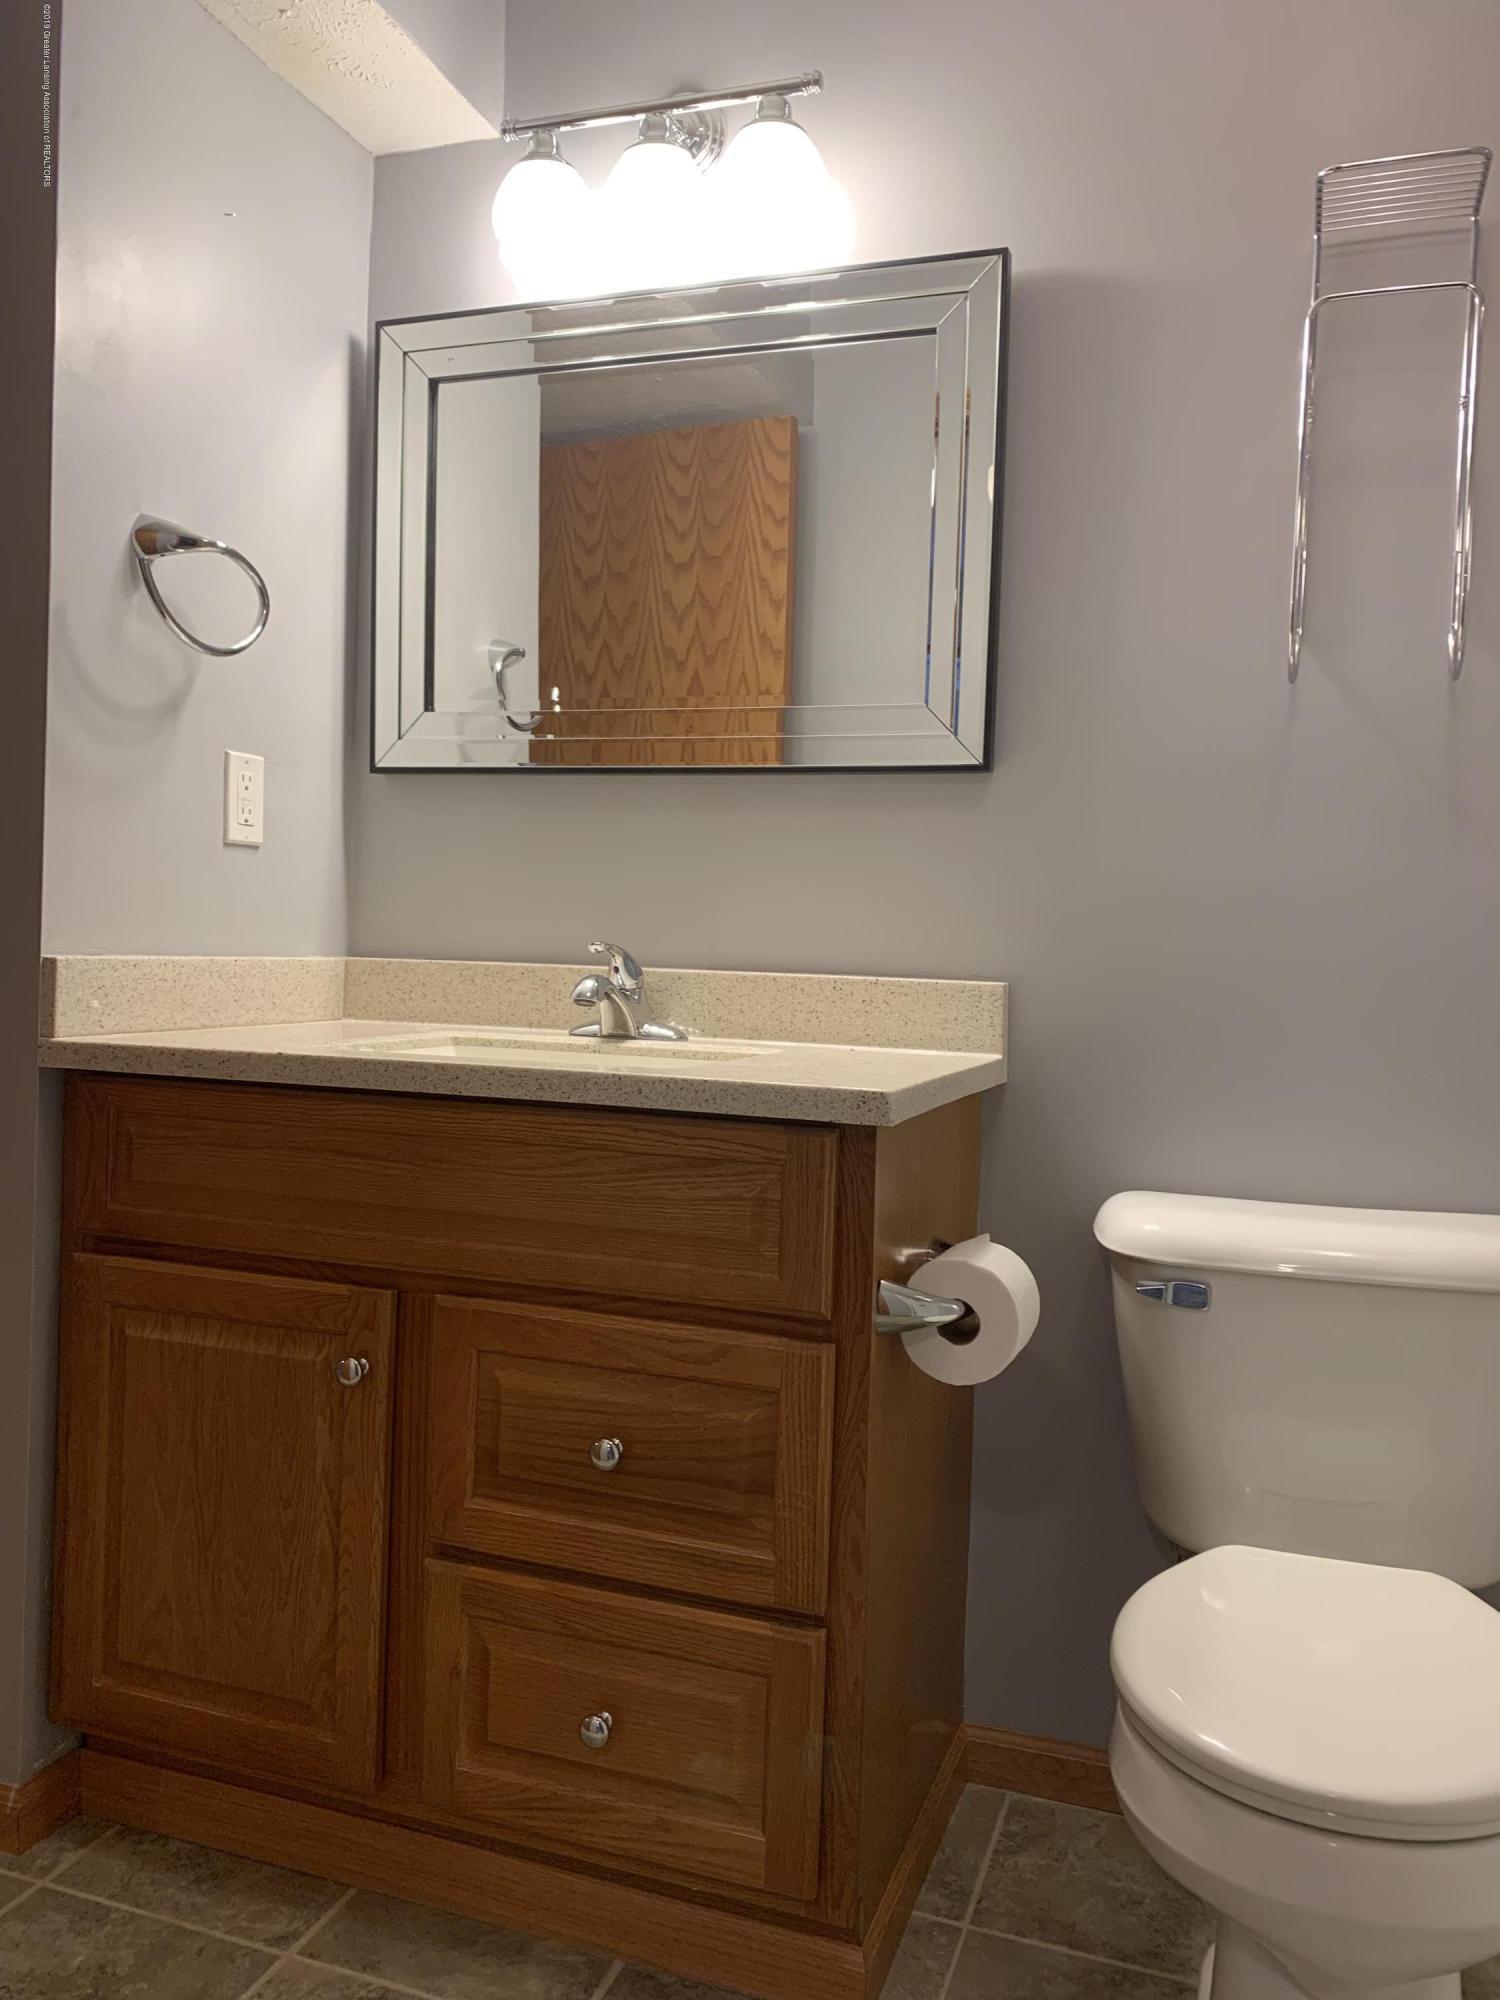 14705 Hardtke Dr - Bathroom - 39